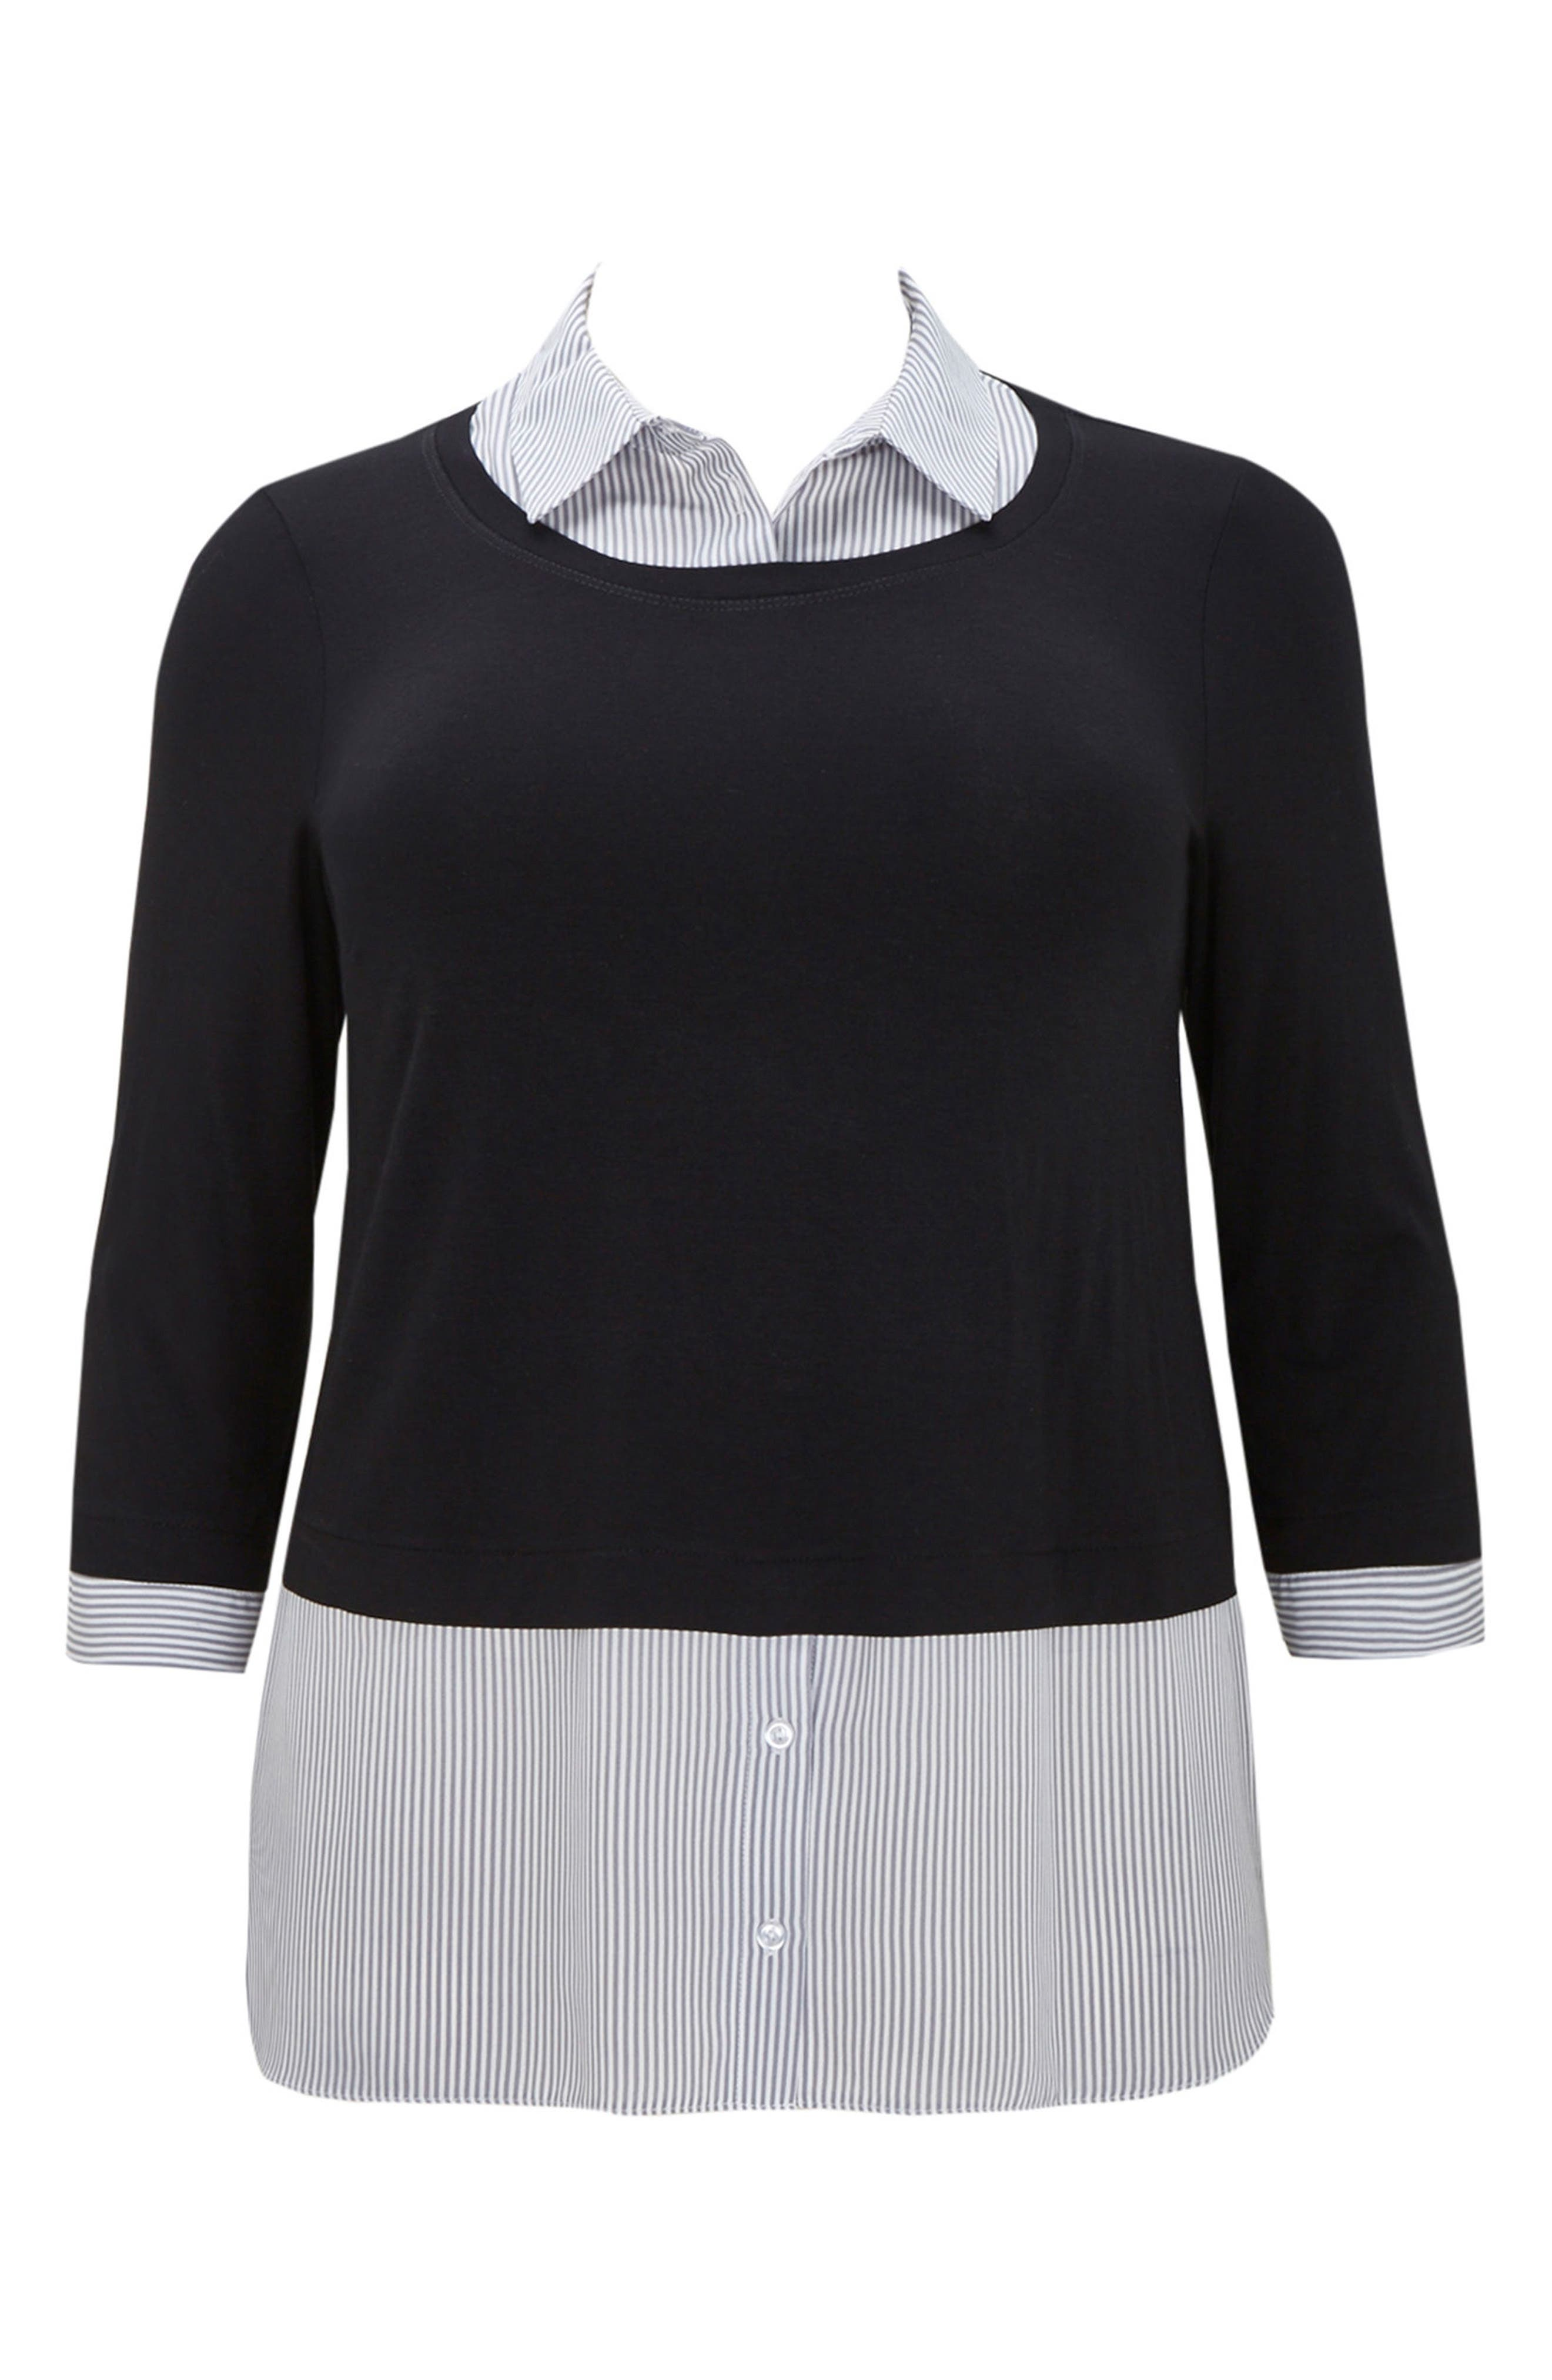 Stripe & Solid 2-in-1 Shirt,                             Alternate thumbnail 4, color,                             Dark Multi